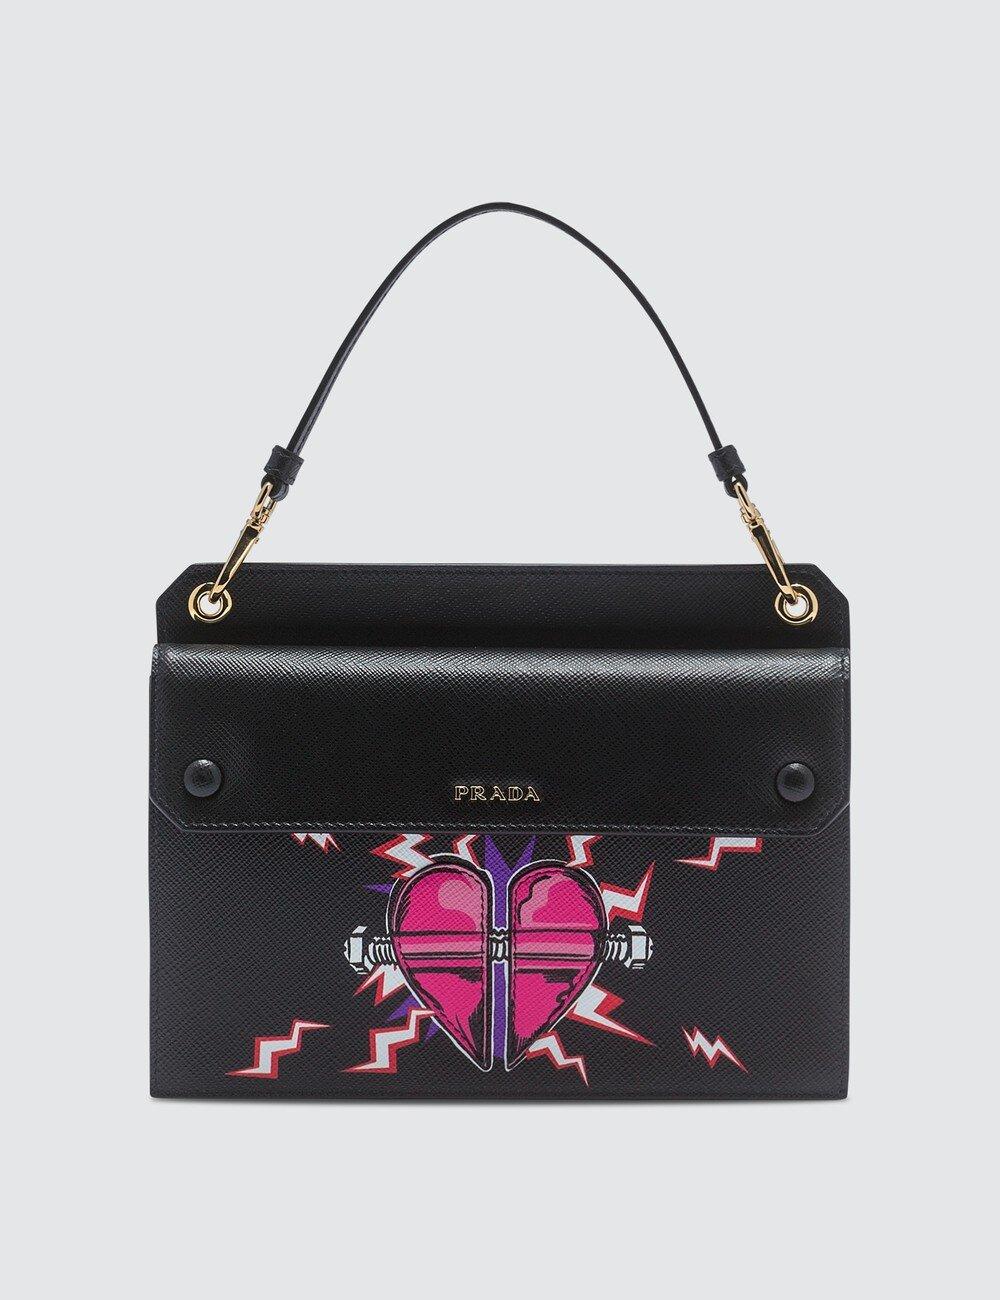 △ Prada Heart Print Leather Bag  HK$5,416